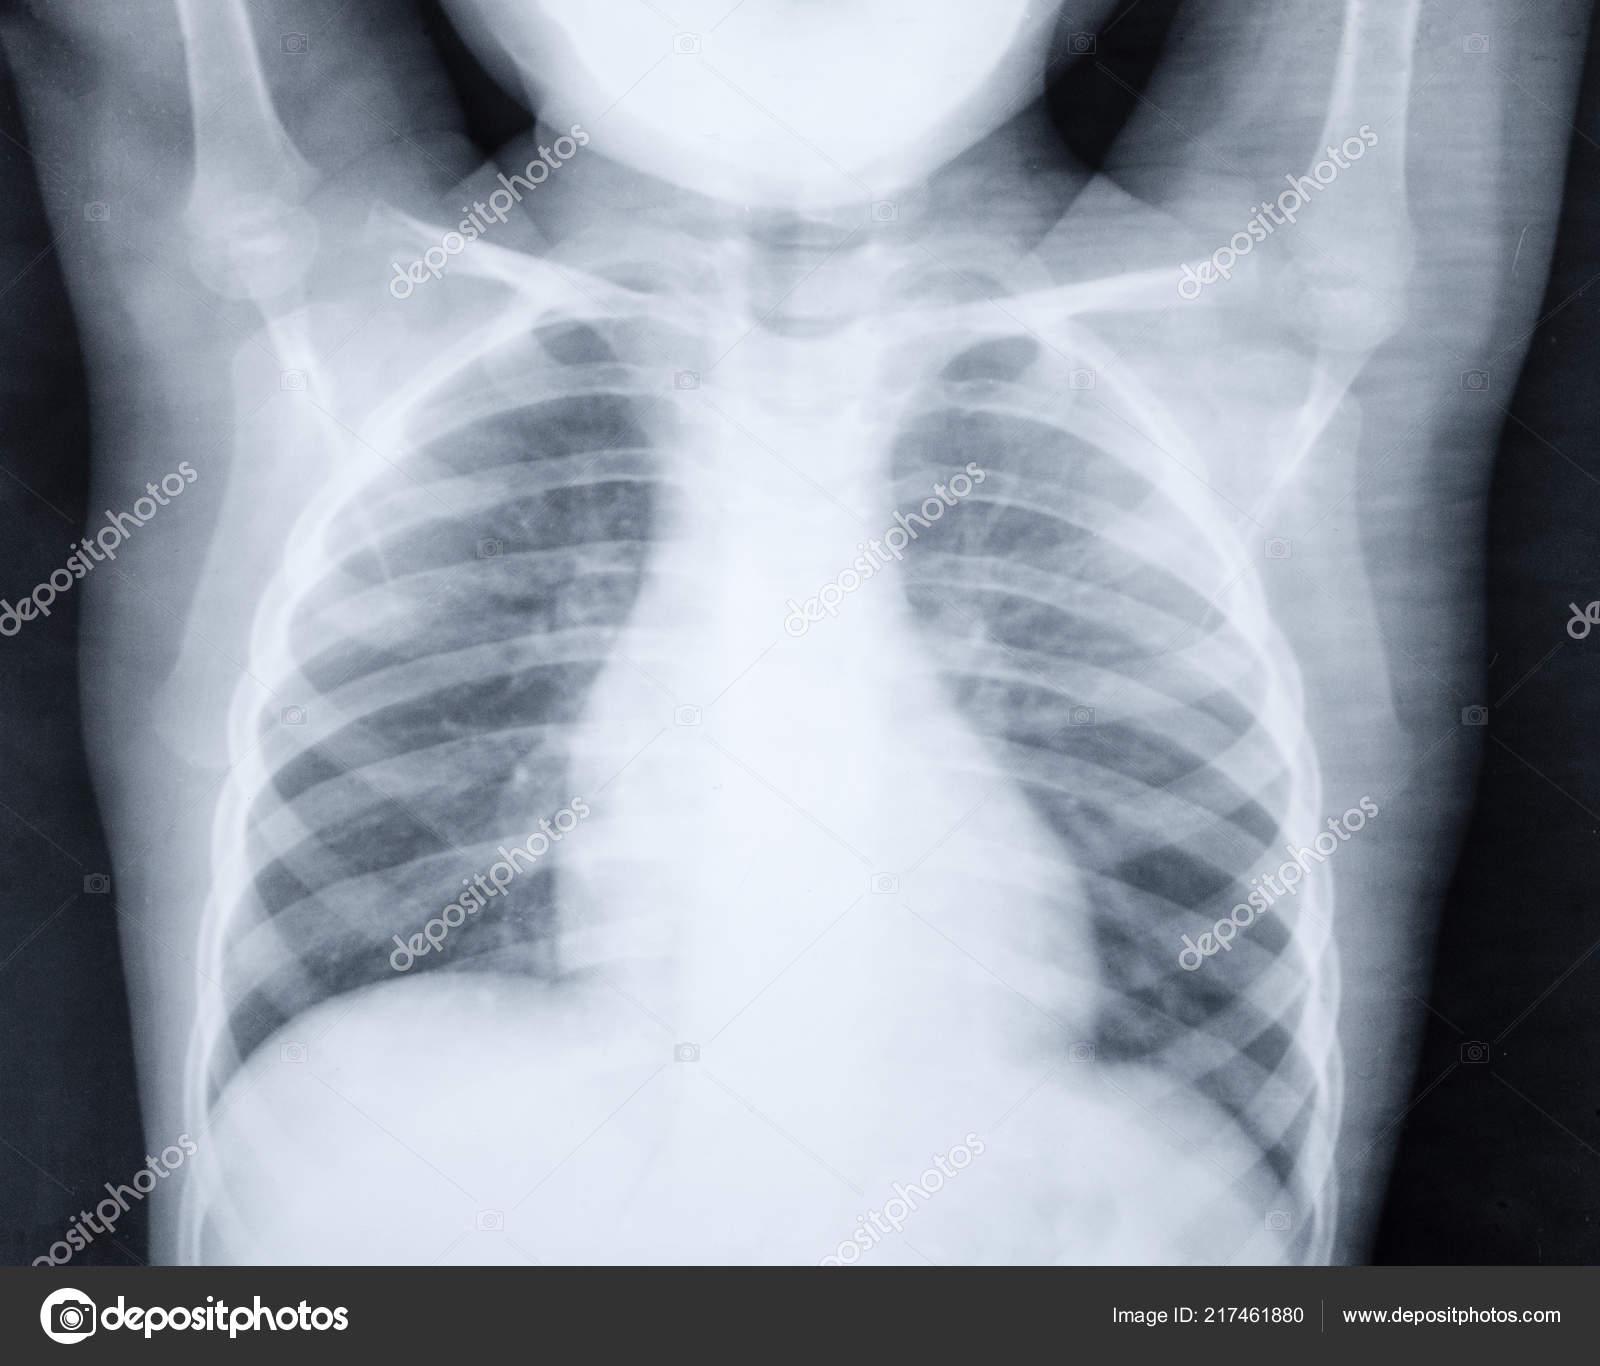 schistosomiasis mellkas röntgen